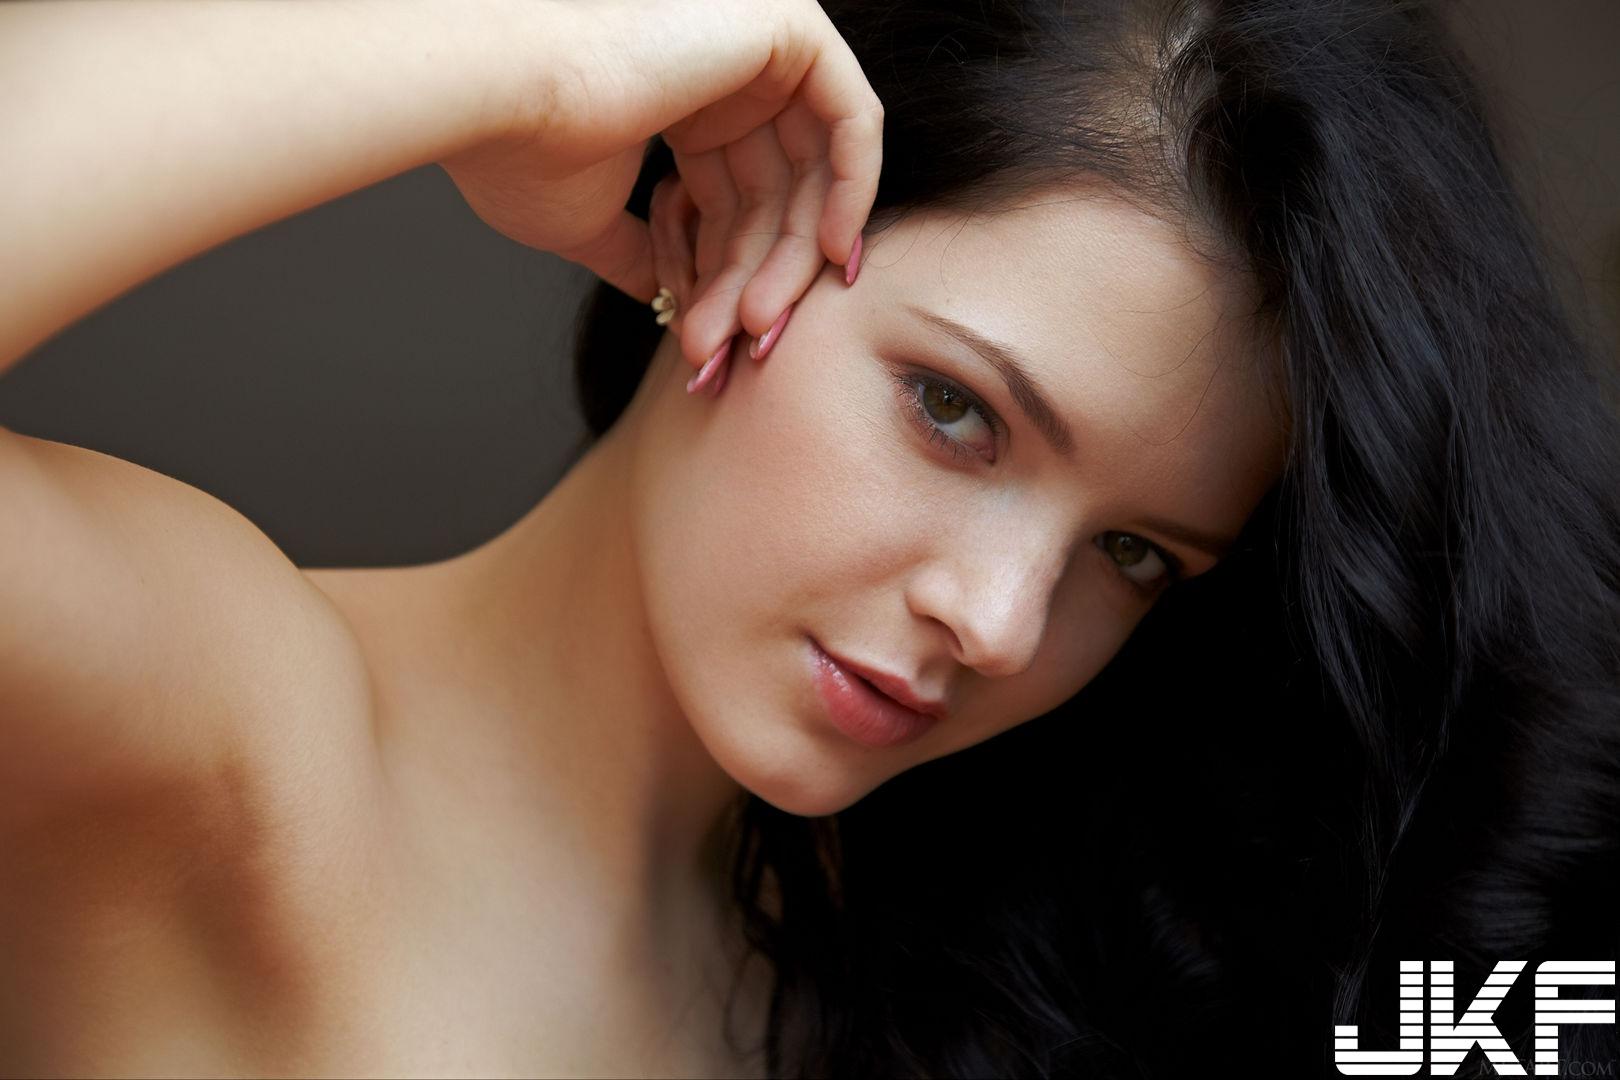 4510-Anie Darling -Anqui(122P) - 貼圖 - 歐美寫真 -